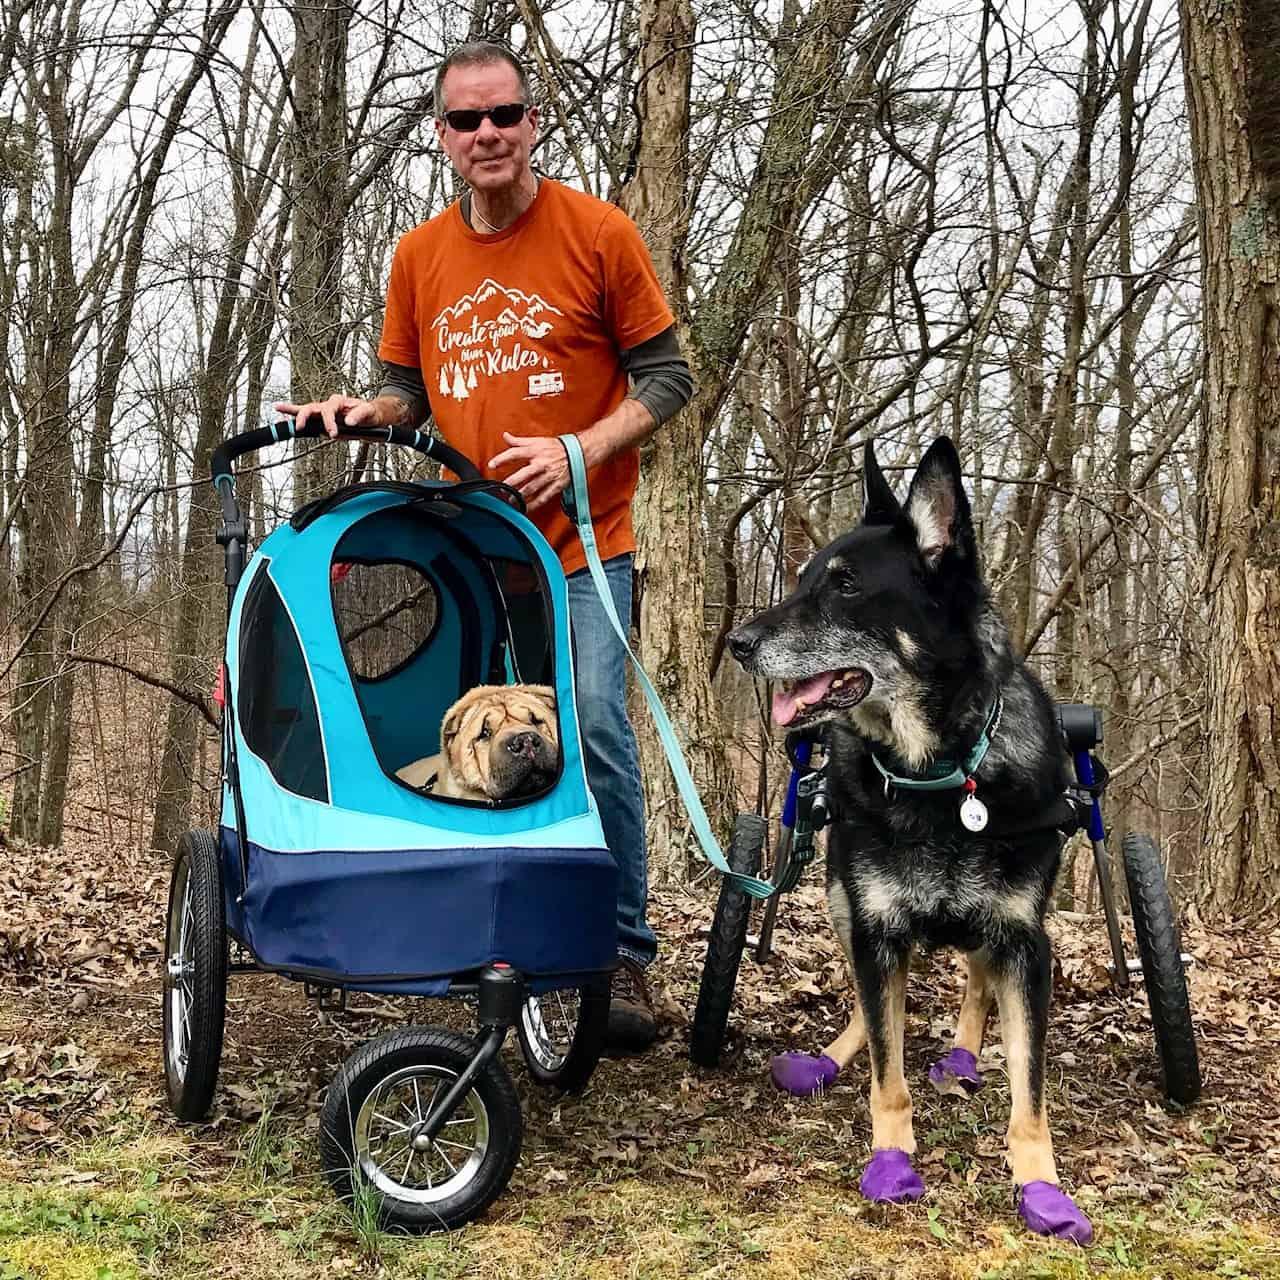 Buster the German Shepherd dog wearing purple boots on a pet friendly trail